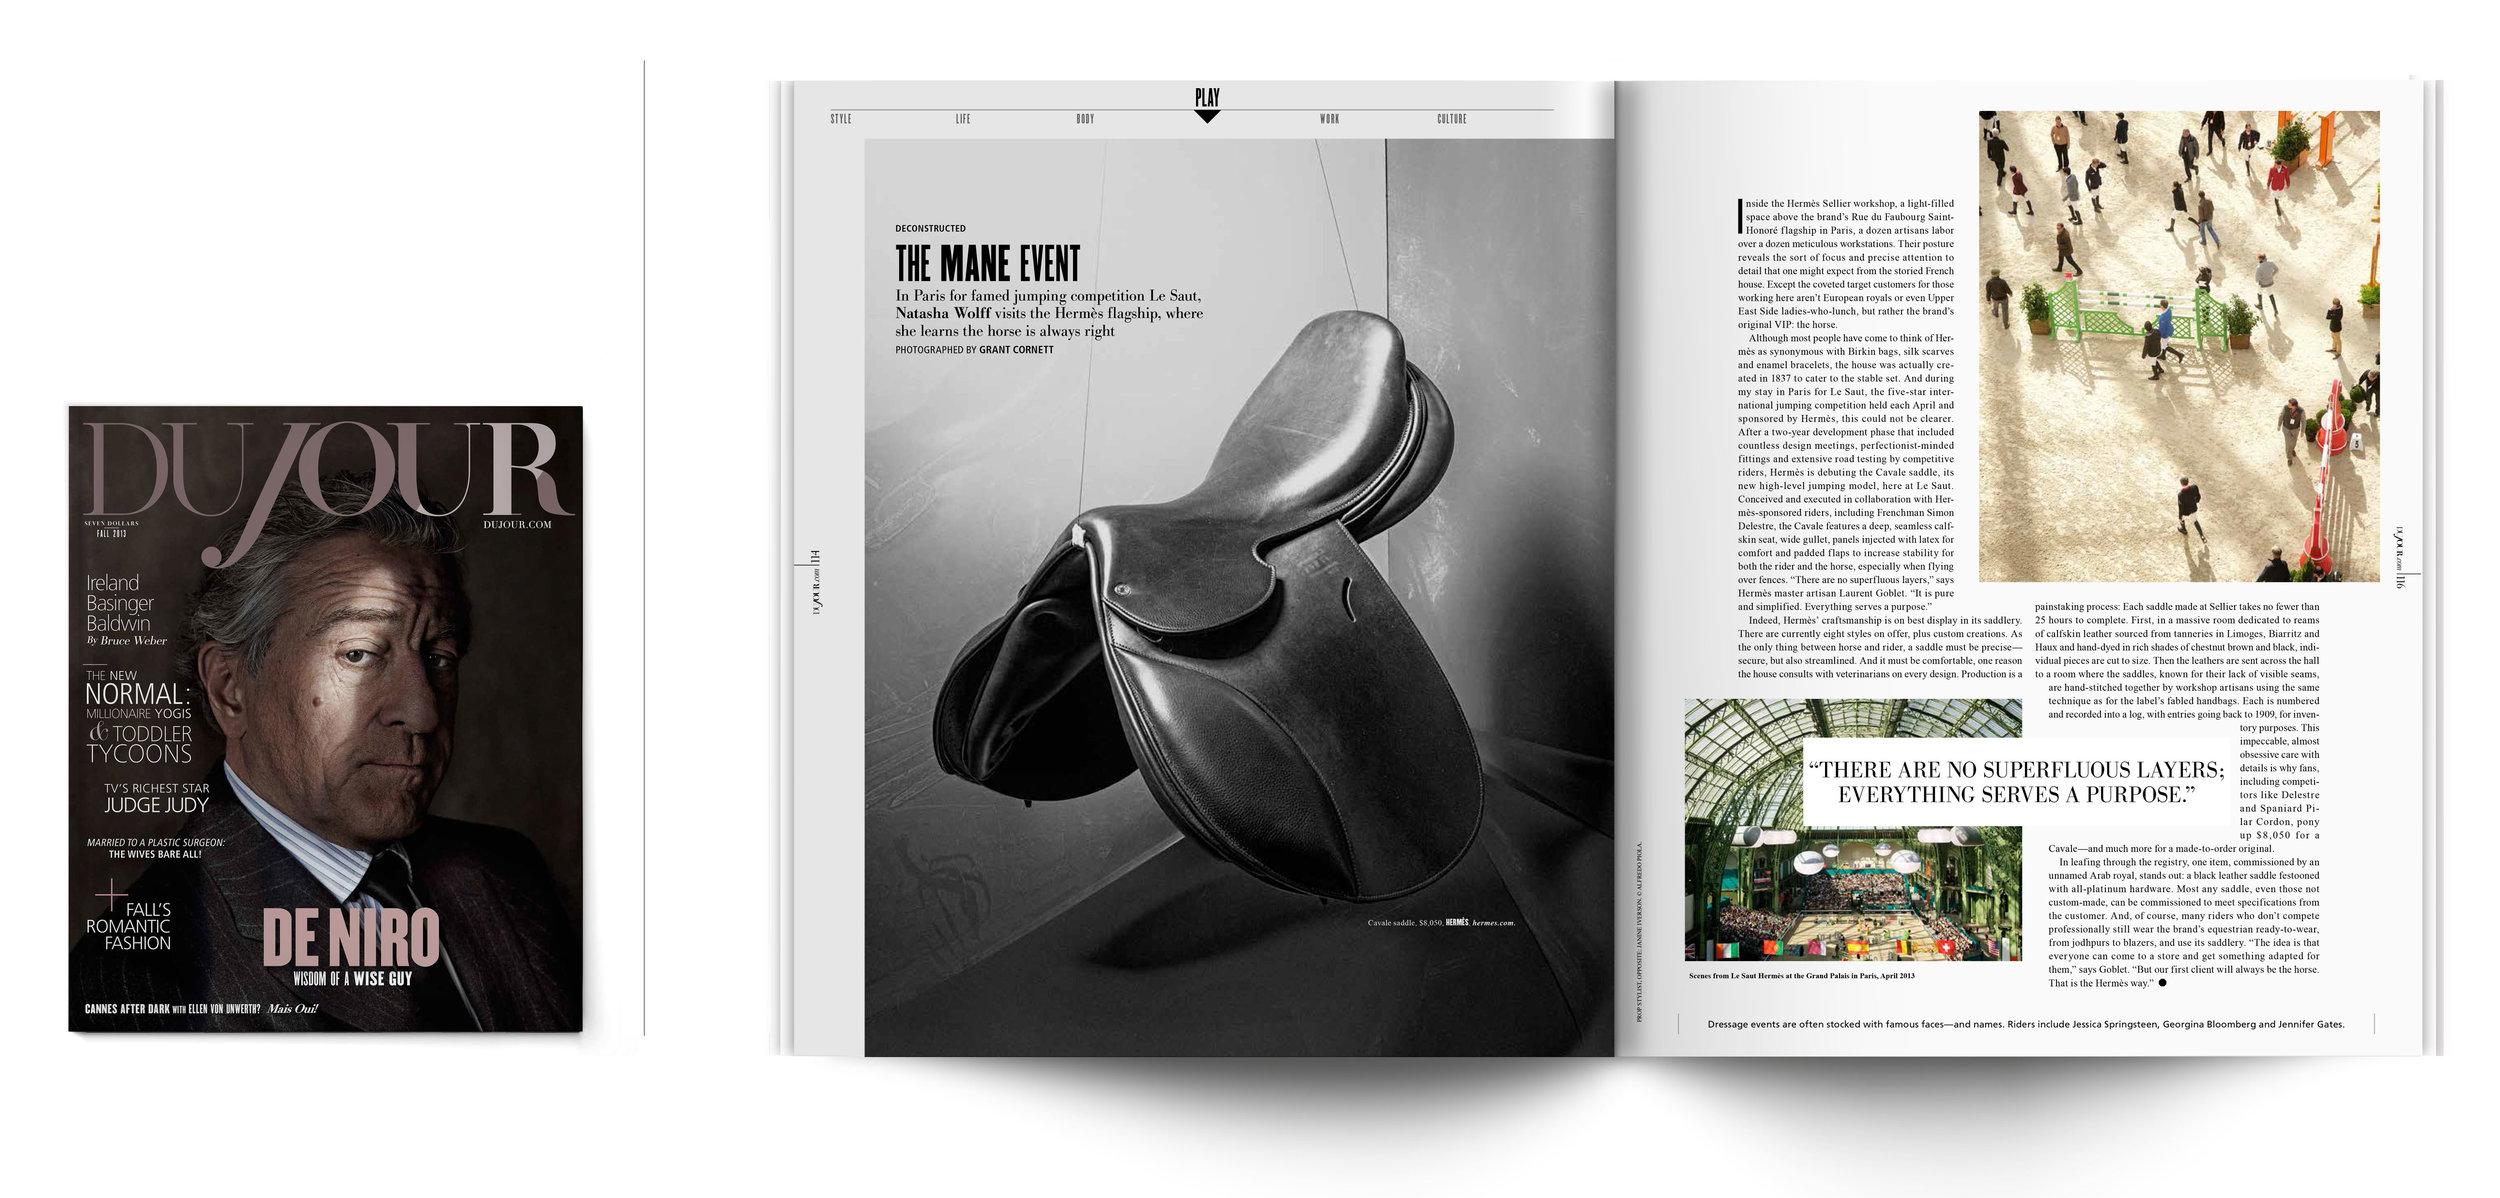 DuJour Magazine |Fall 2013   T   he Mane Event